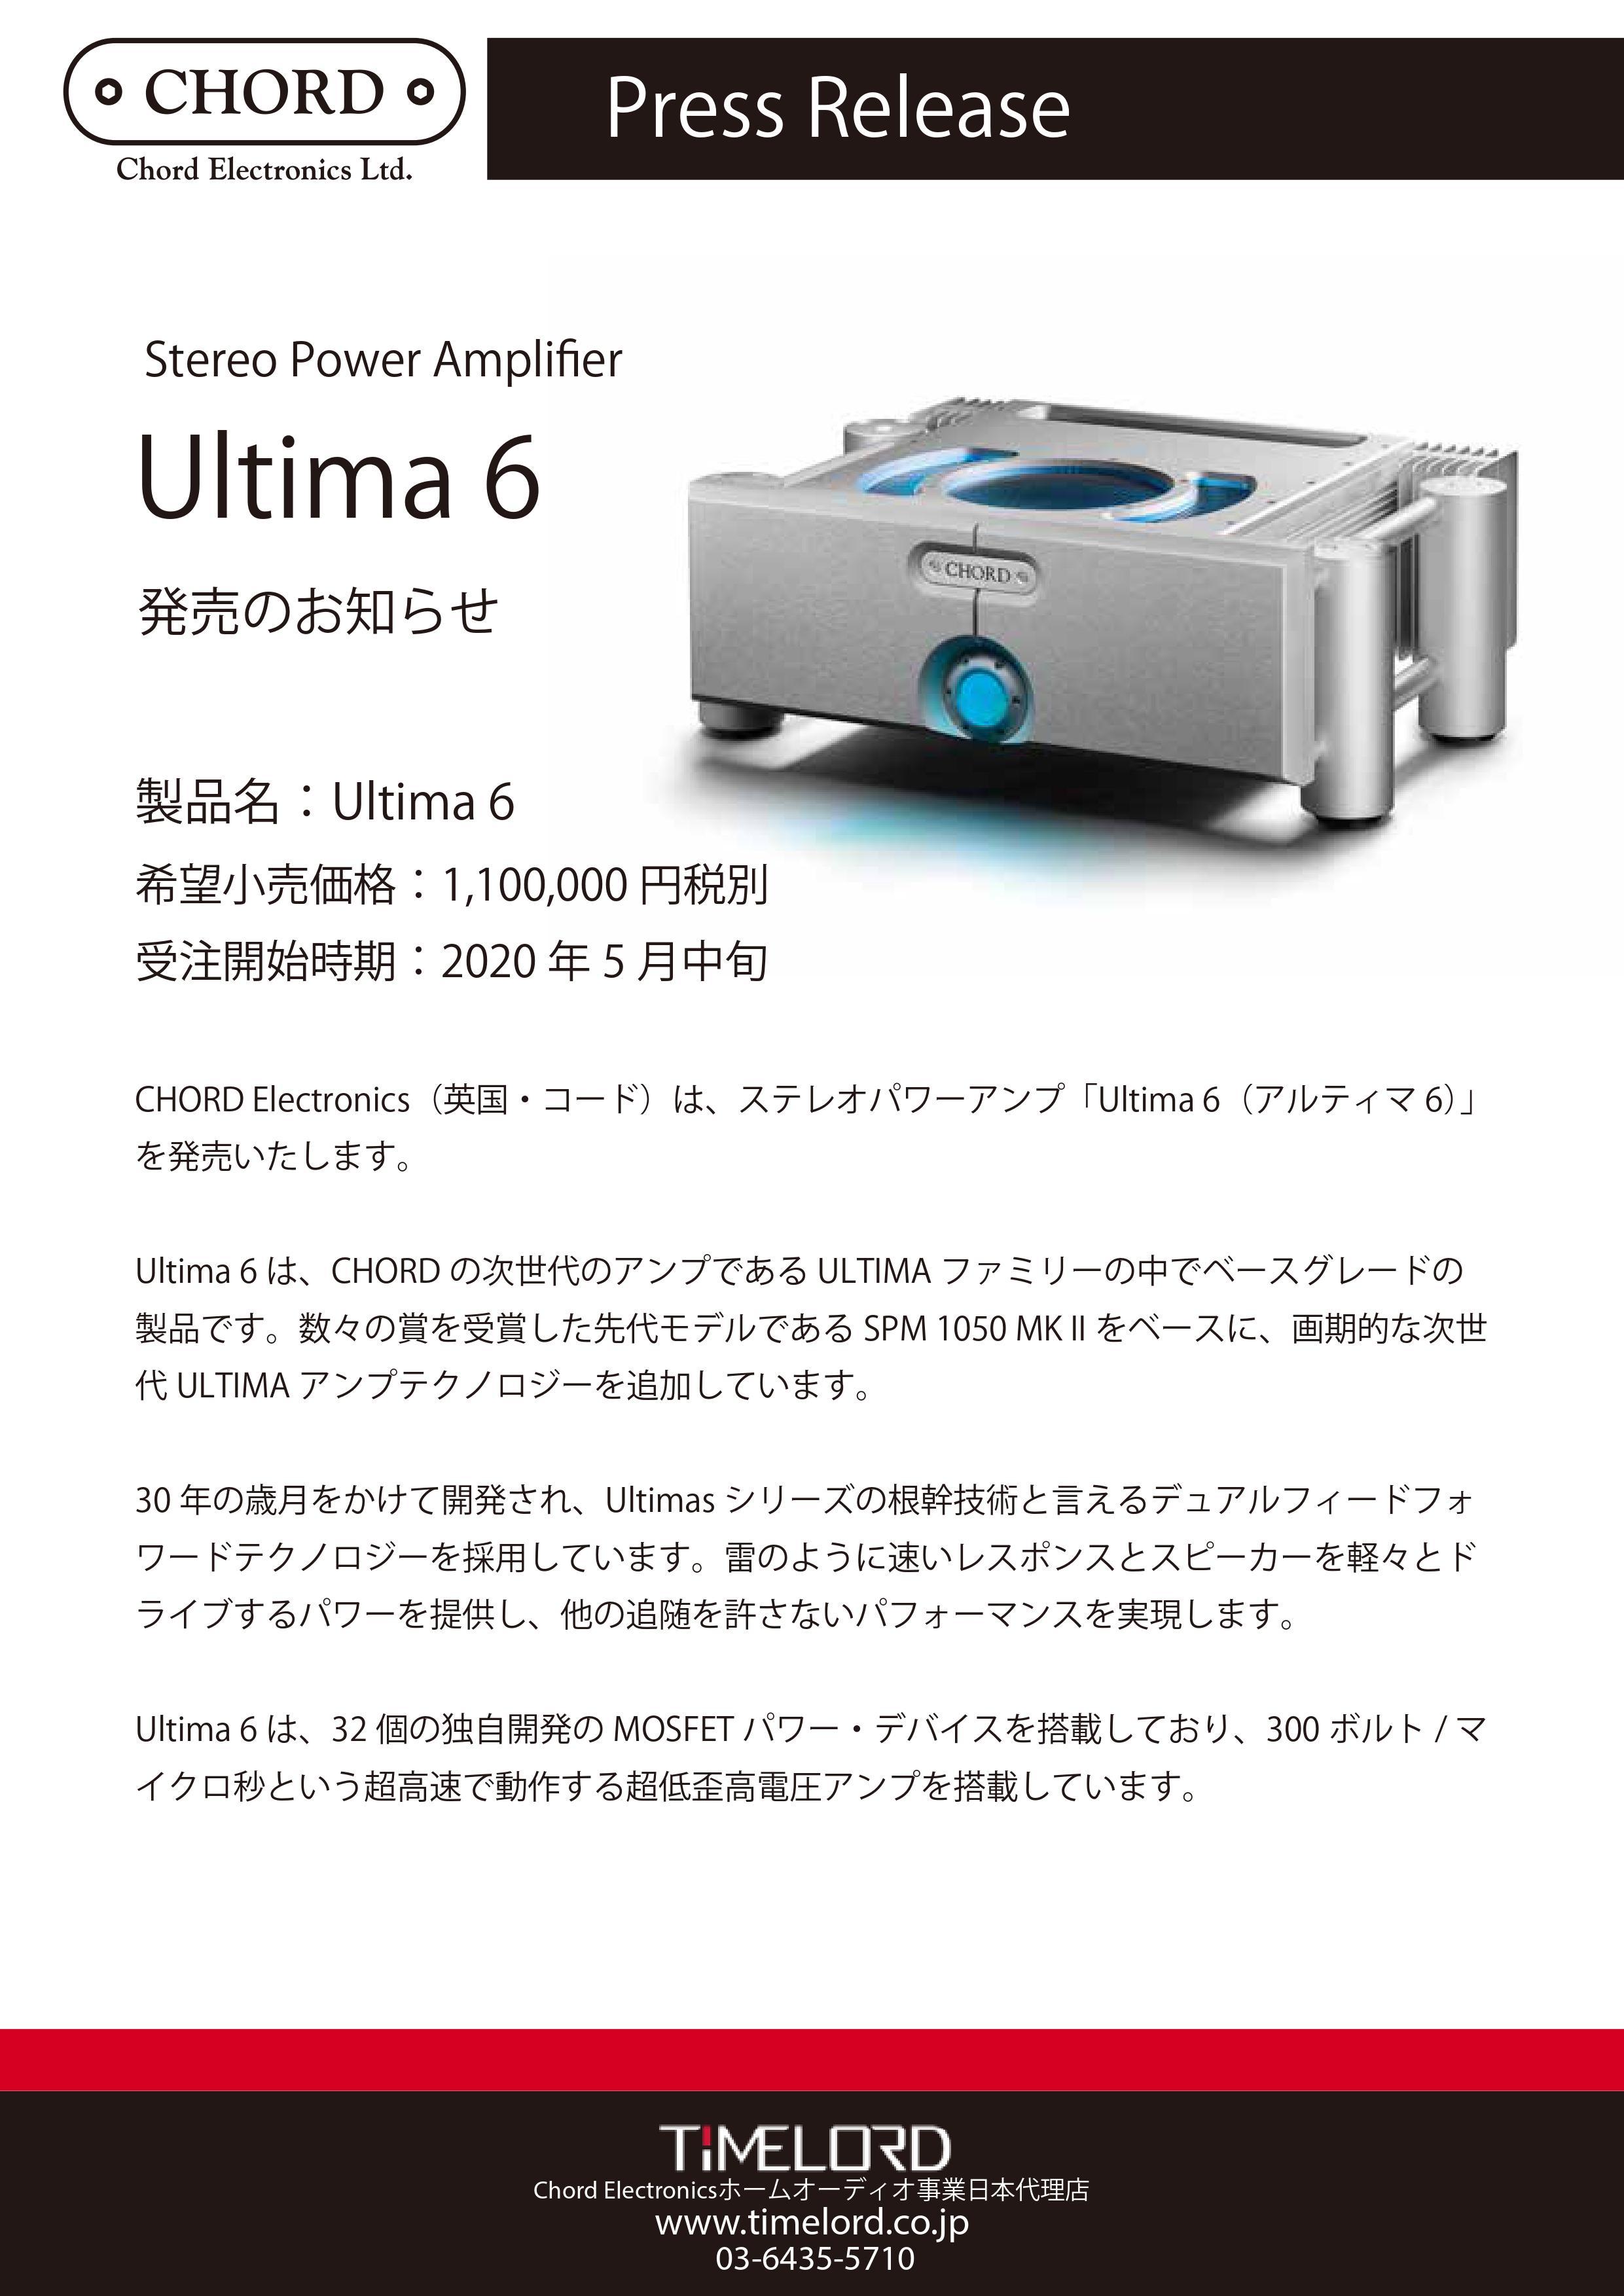 ultima6_1.jpg